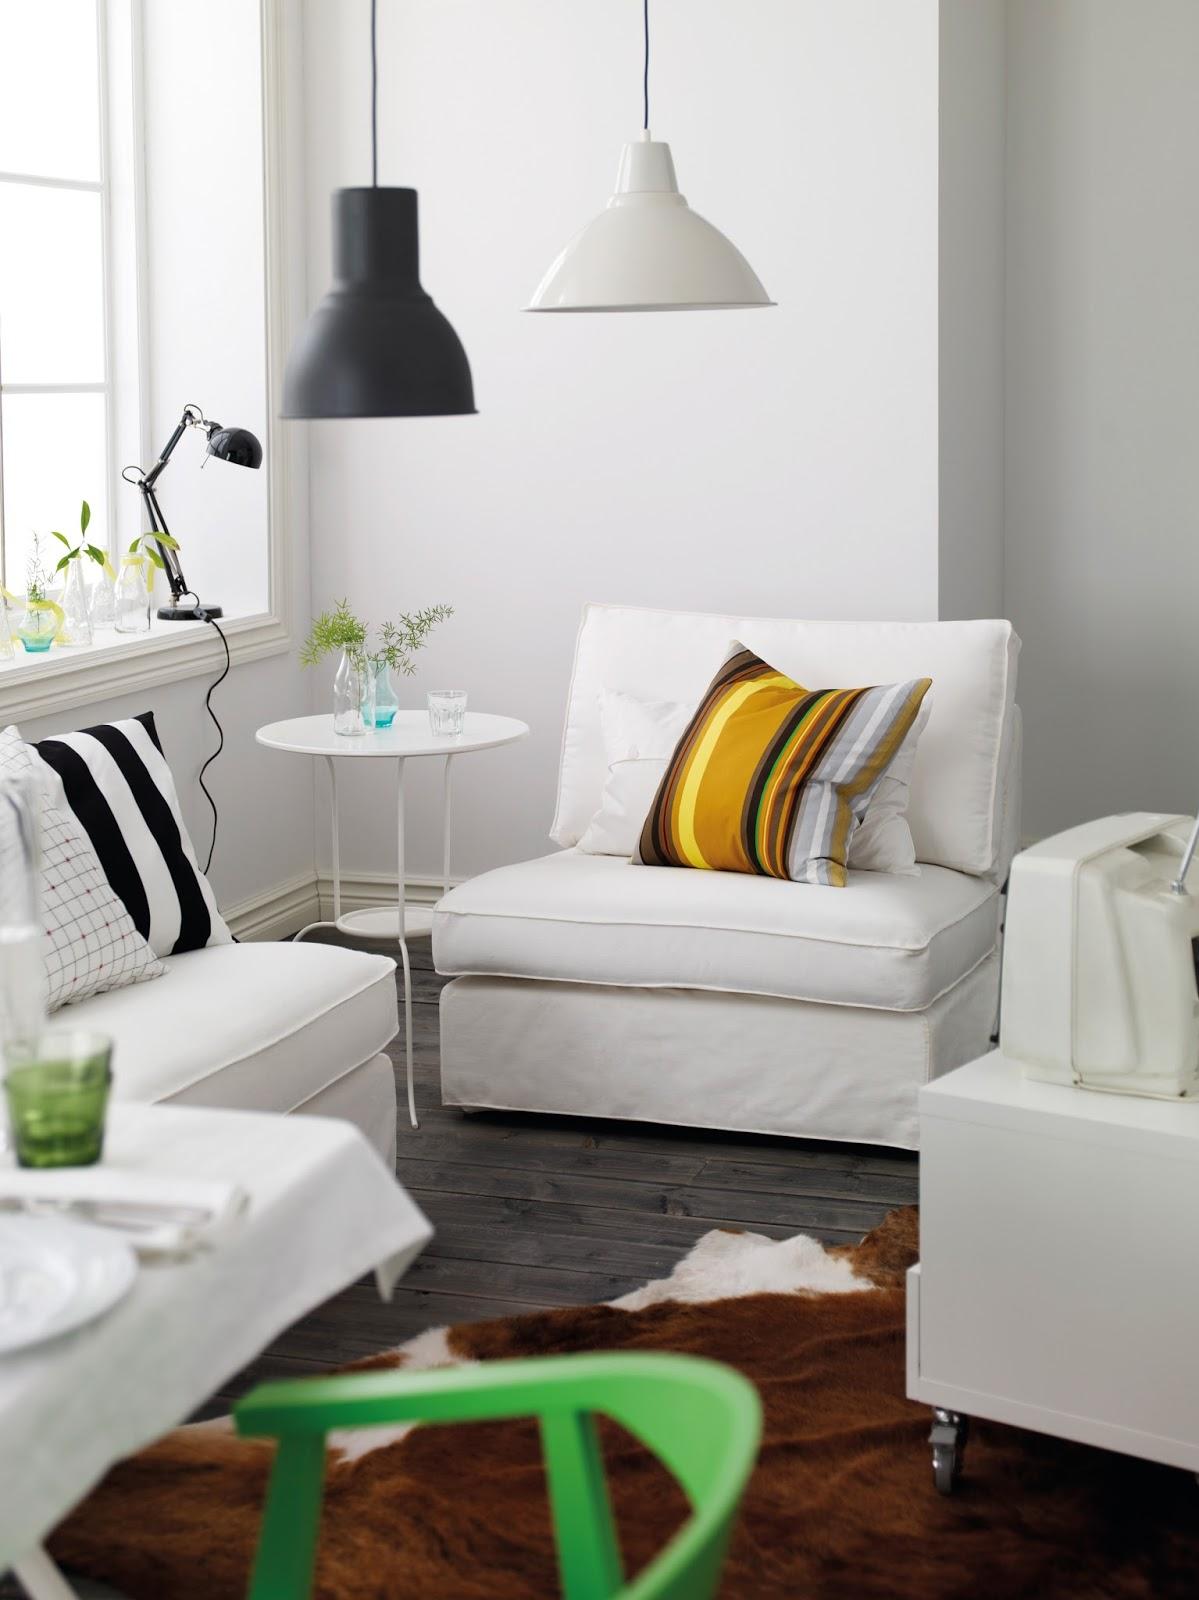 Mes caprices belges decoraci n interiorismo y for Ikea muebles exterior 2014